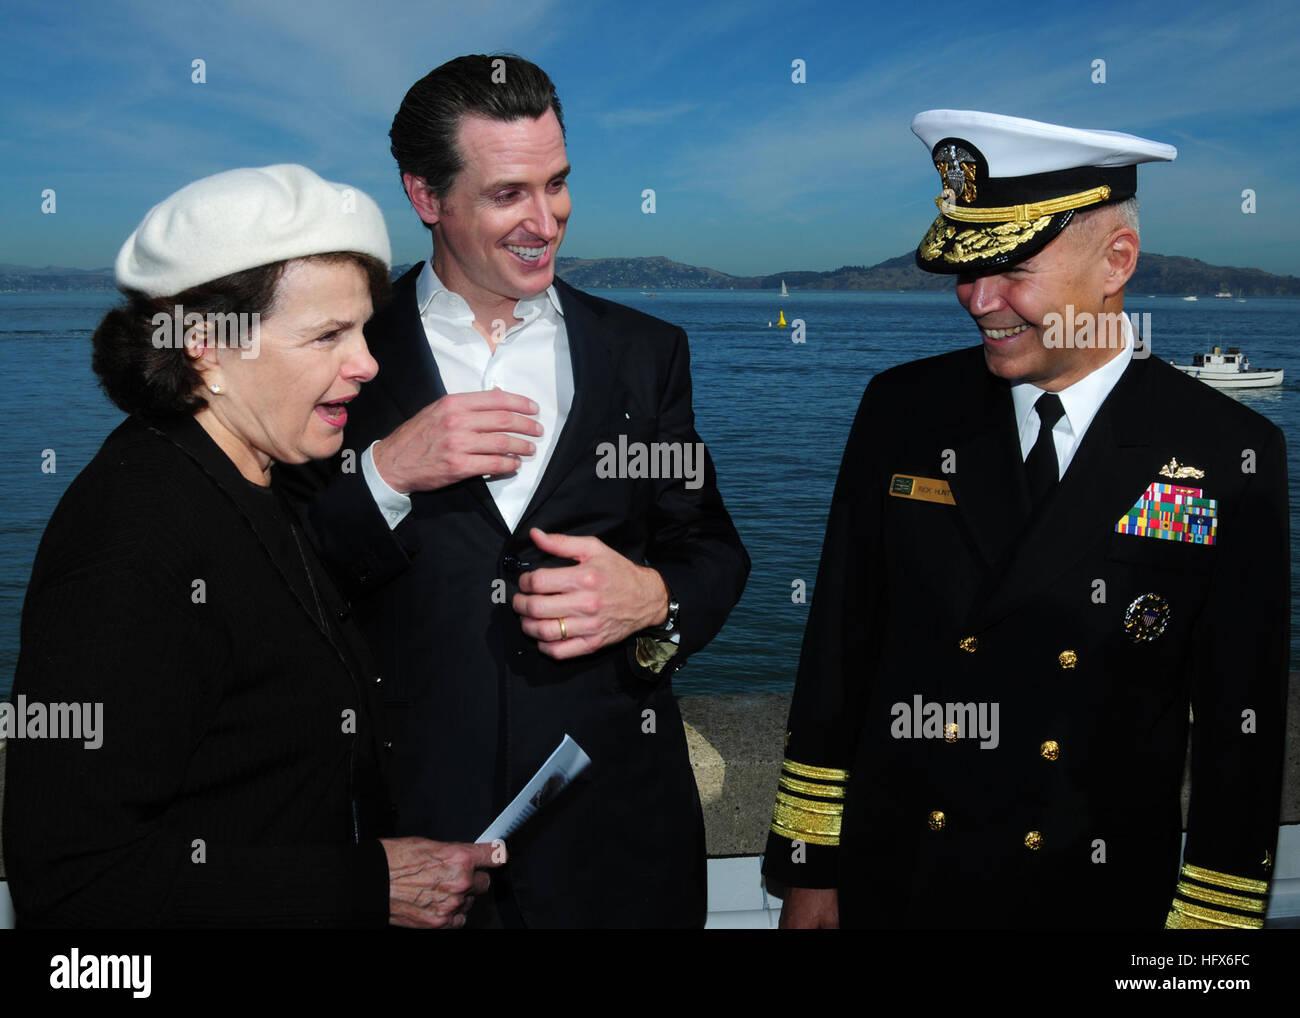 101009-N-3570S-299  SAN FRANCISCO (Oct. 9, 2010) Vice Adm. Richard W. Hunt, commander of U.S. 3rd Fleet speaks with - Stock Image